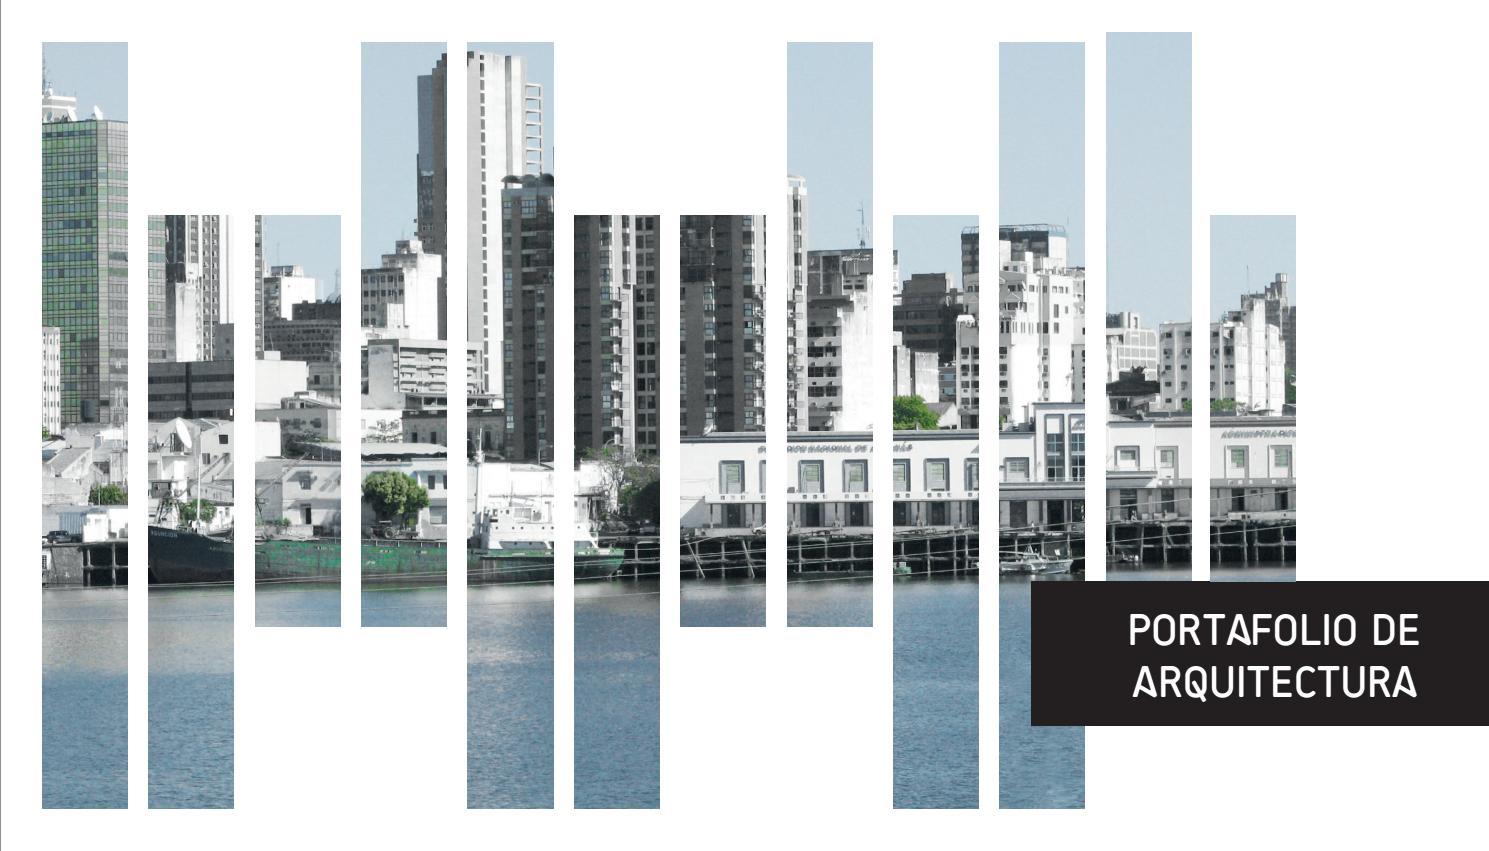 Portafolio arquitectura andres ramirez puj by andres for Portafolio arquitectura